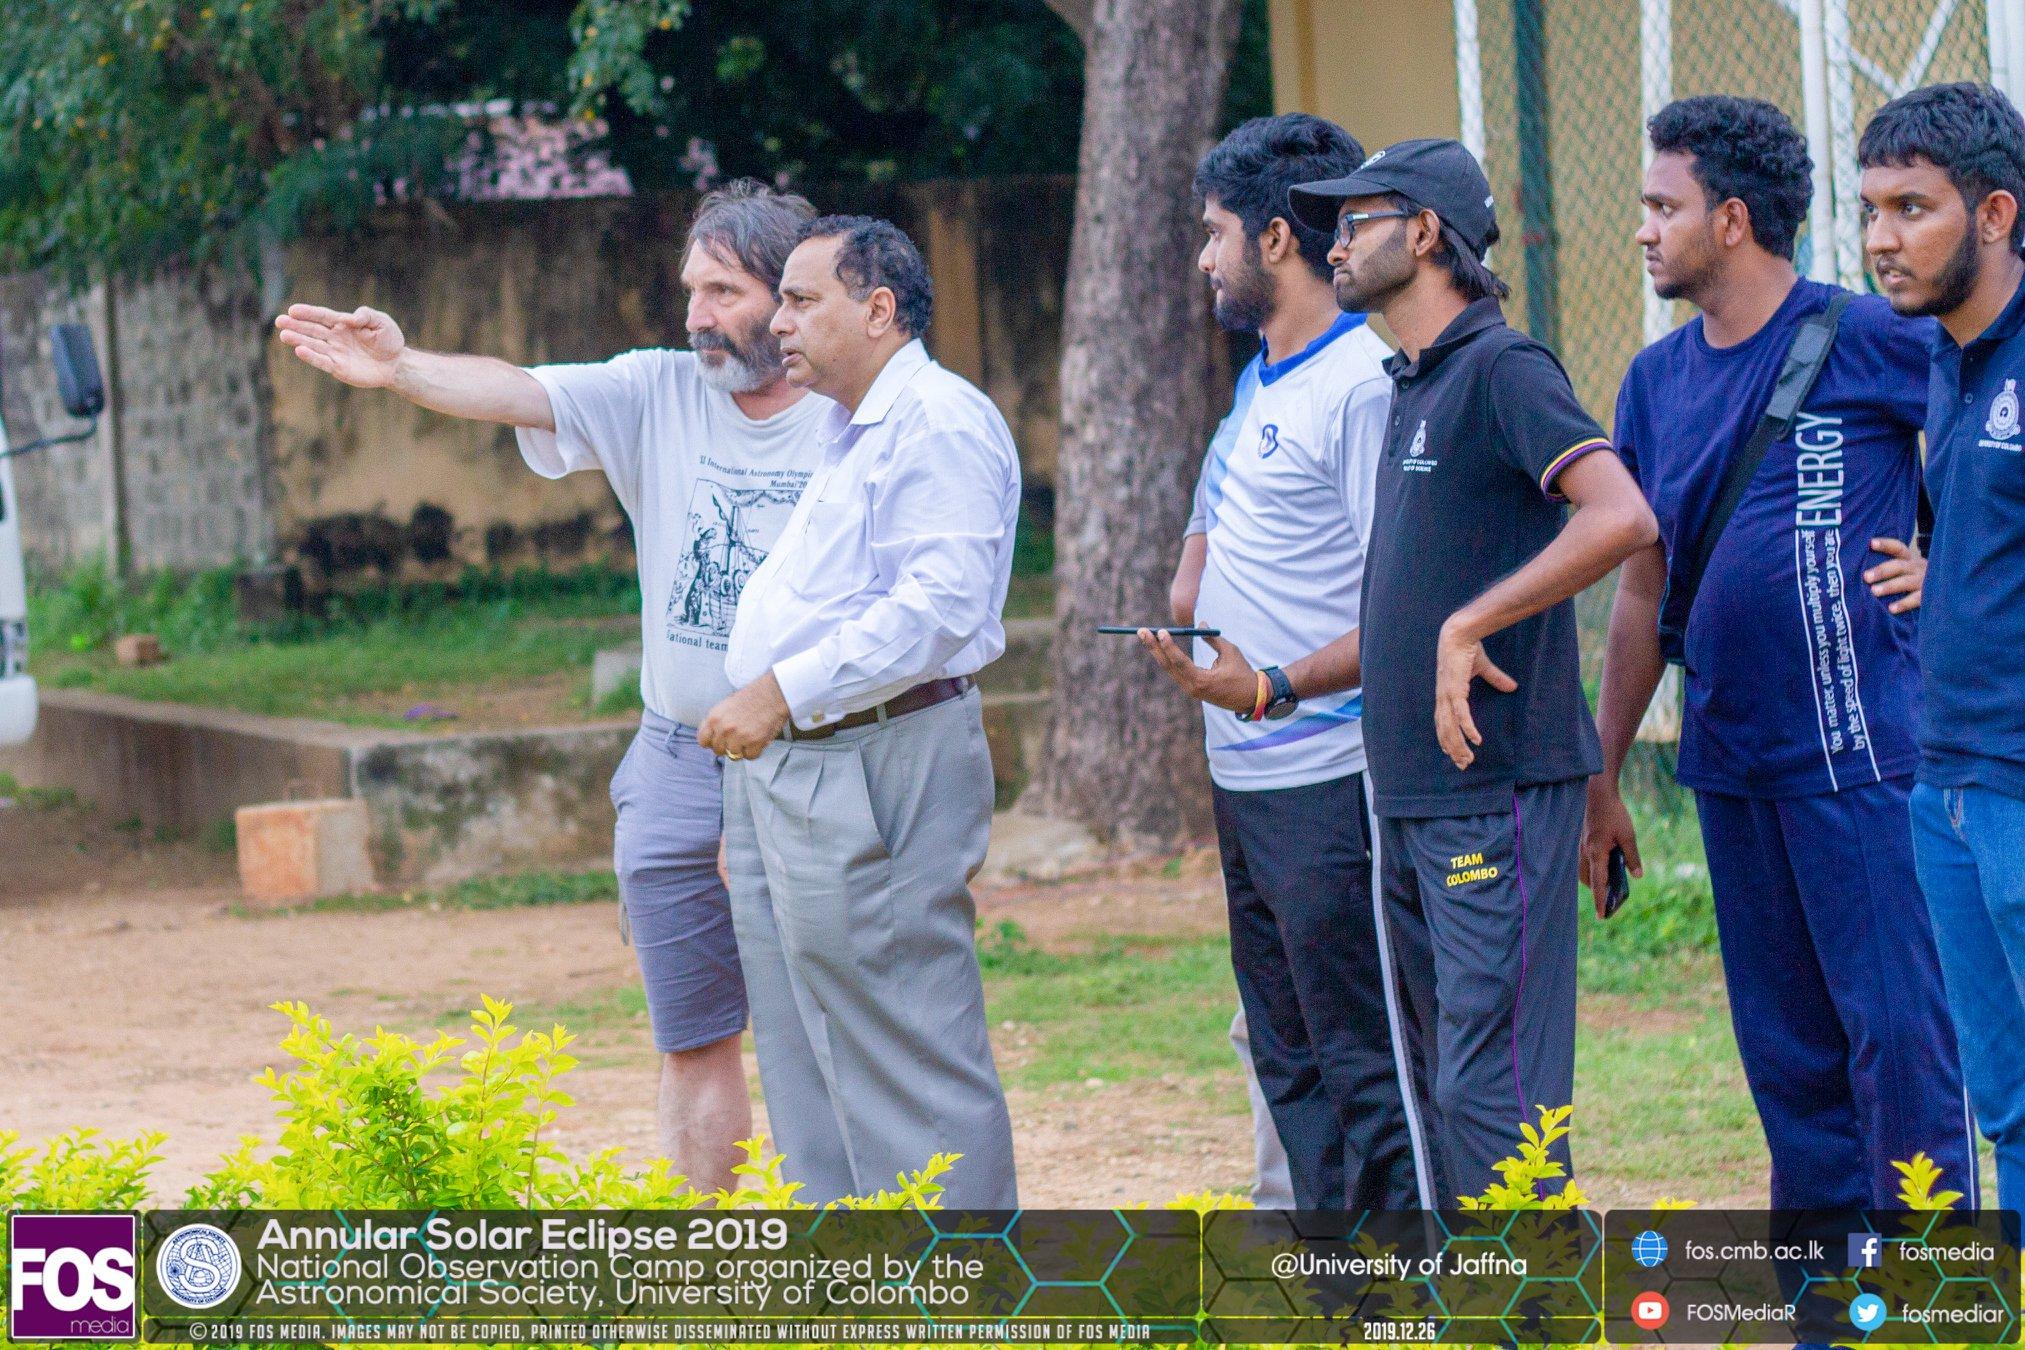 Dr. Gavrilov and Prof. Chandana Jayarathne deciding where to set up our site